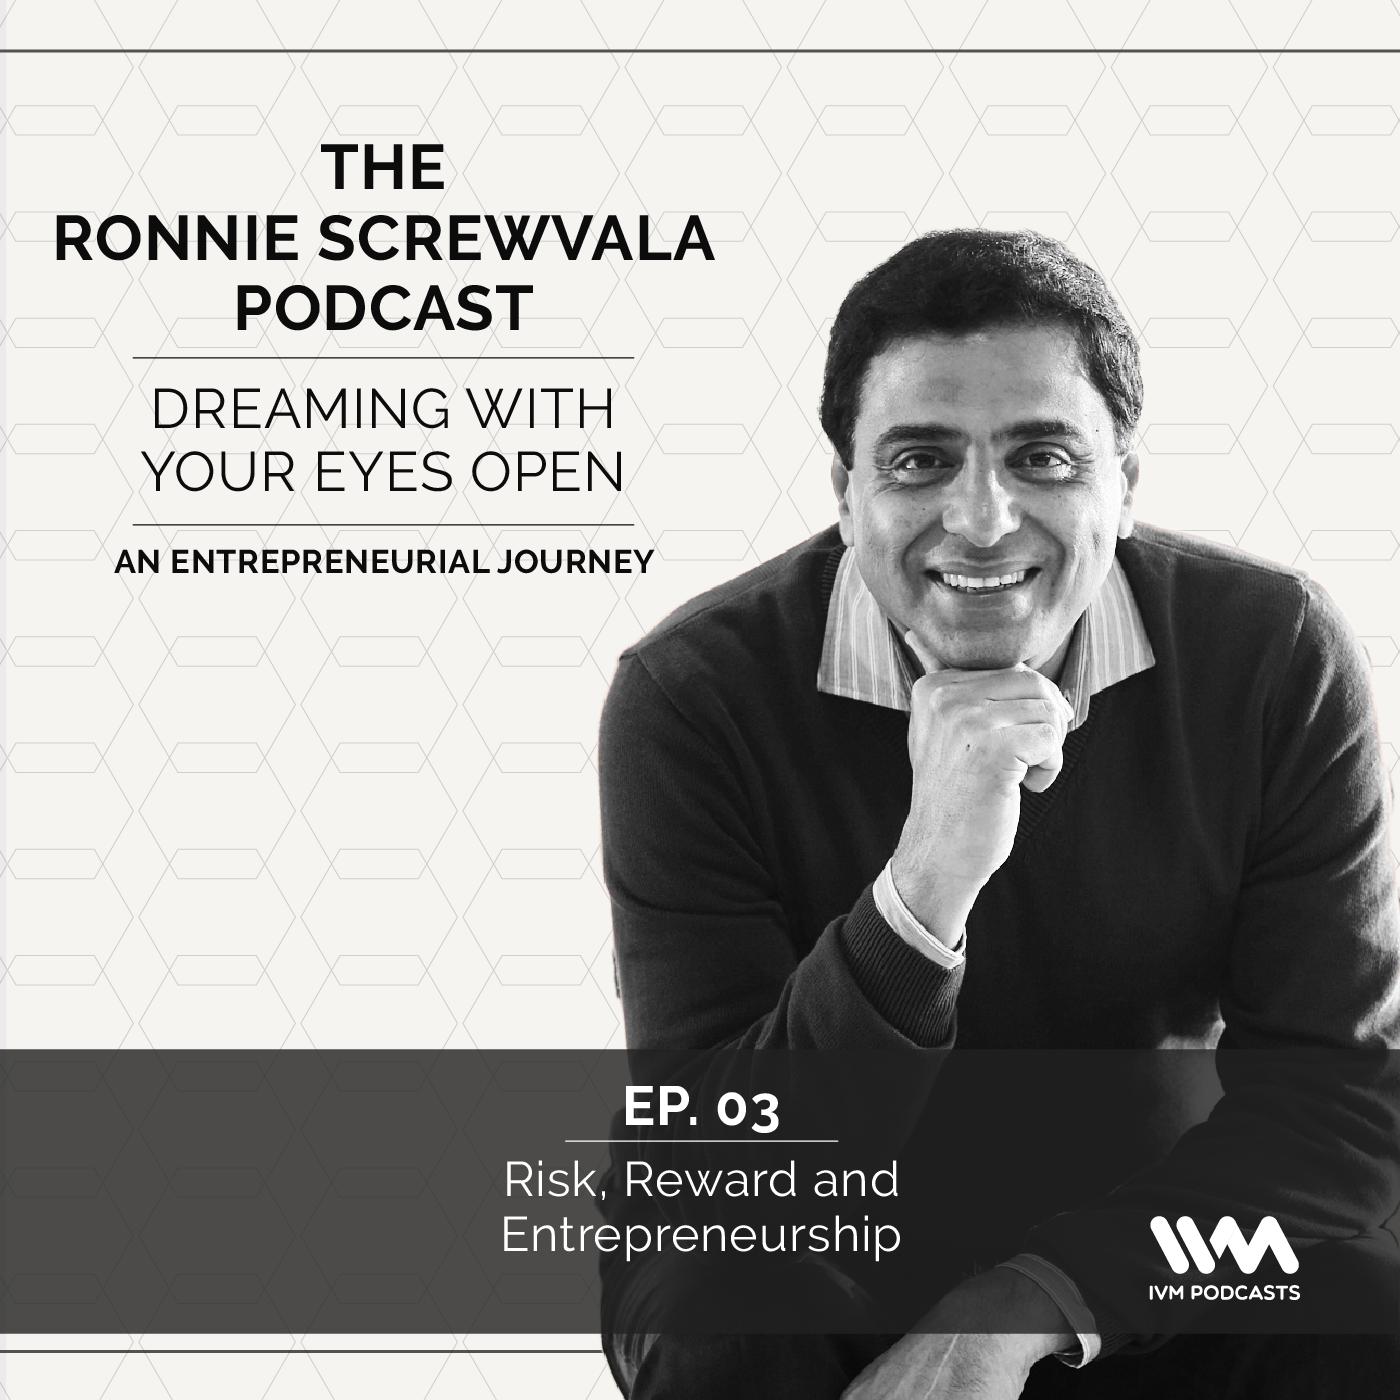 Ep. 03: Risk, Reward and Entrepreneurship